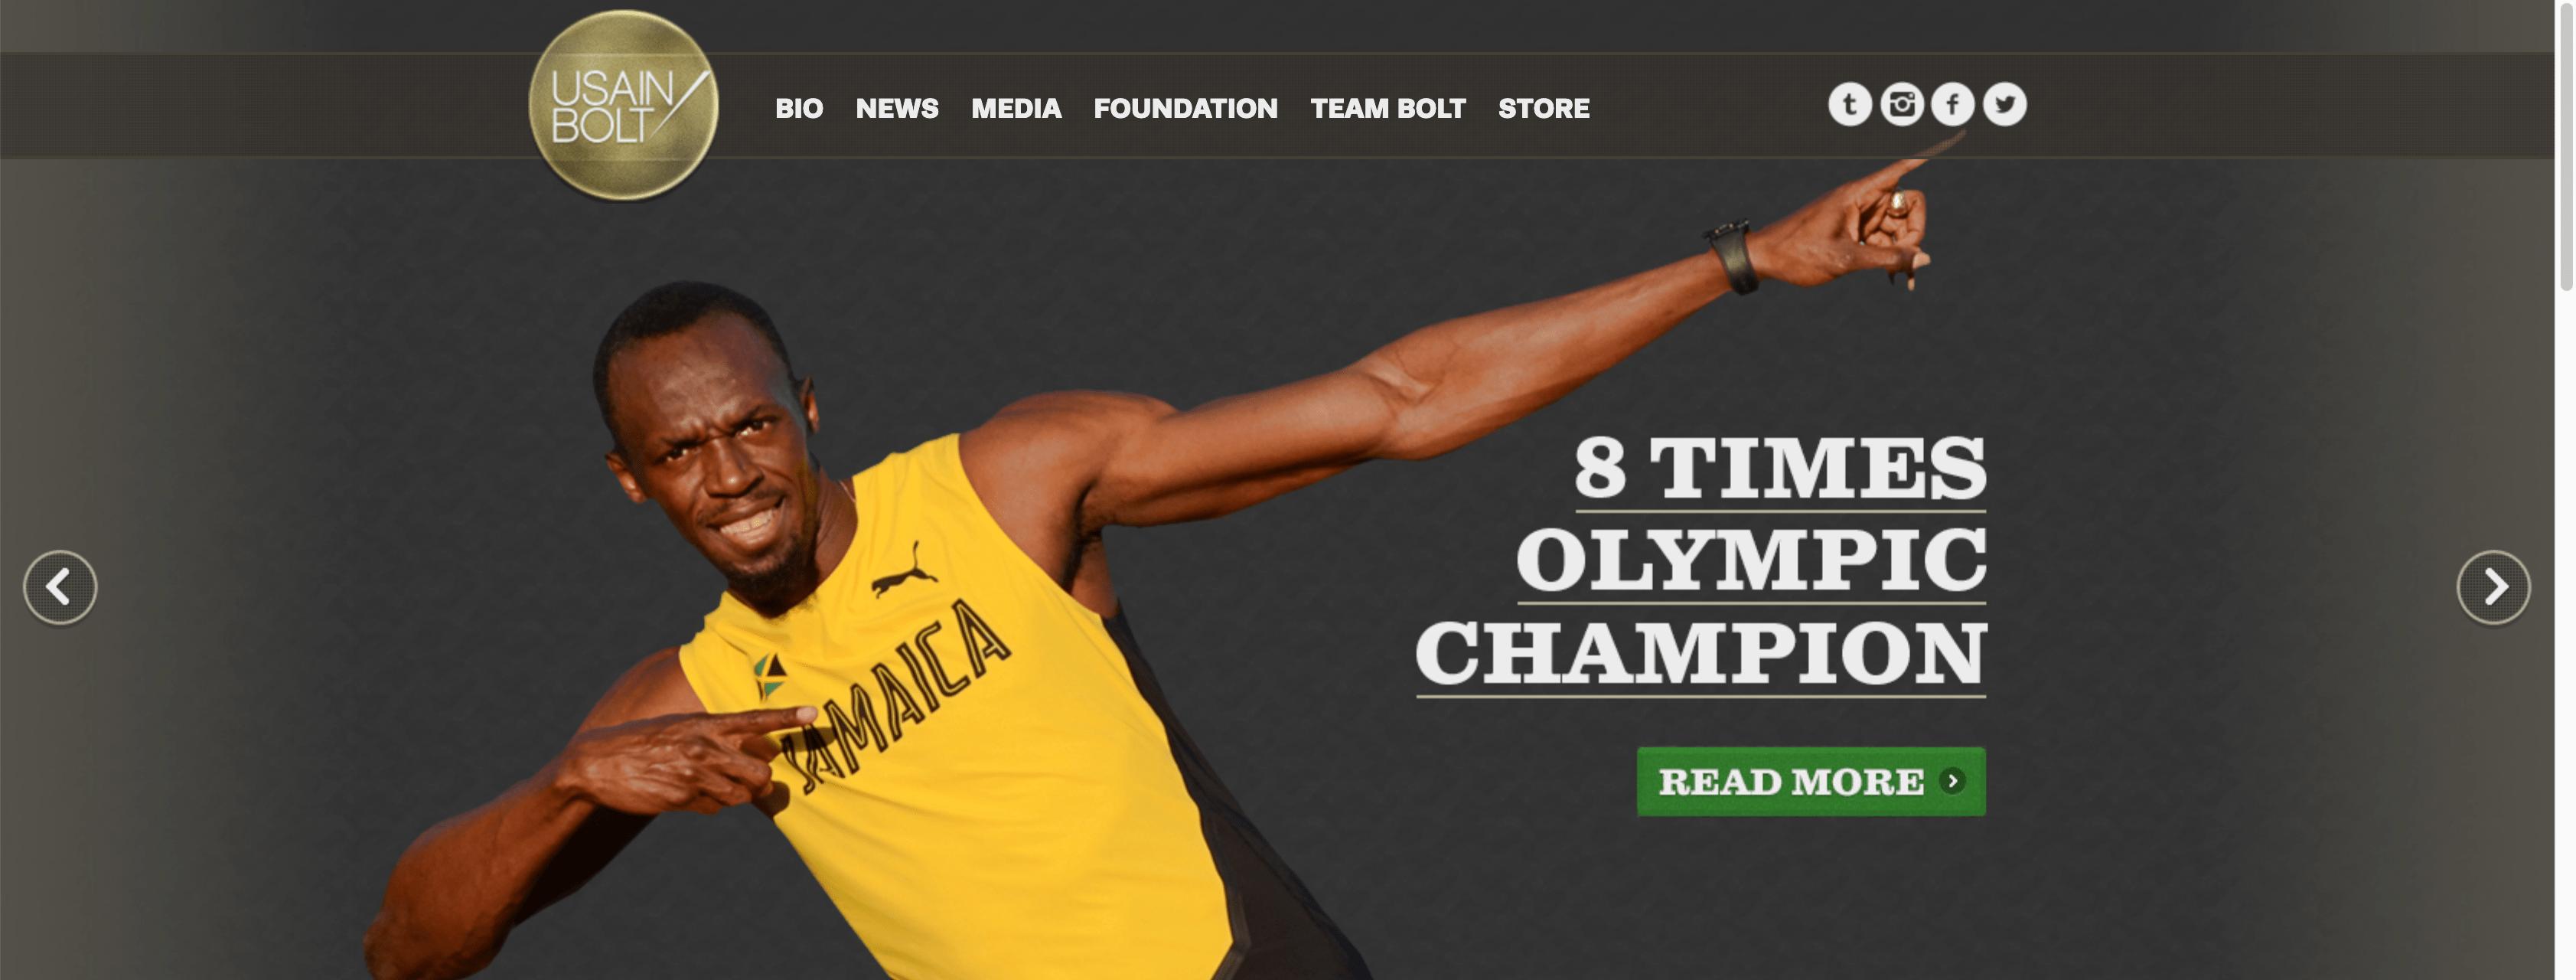 Web personal popular ejemplo Usain Bolt